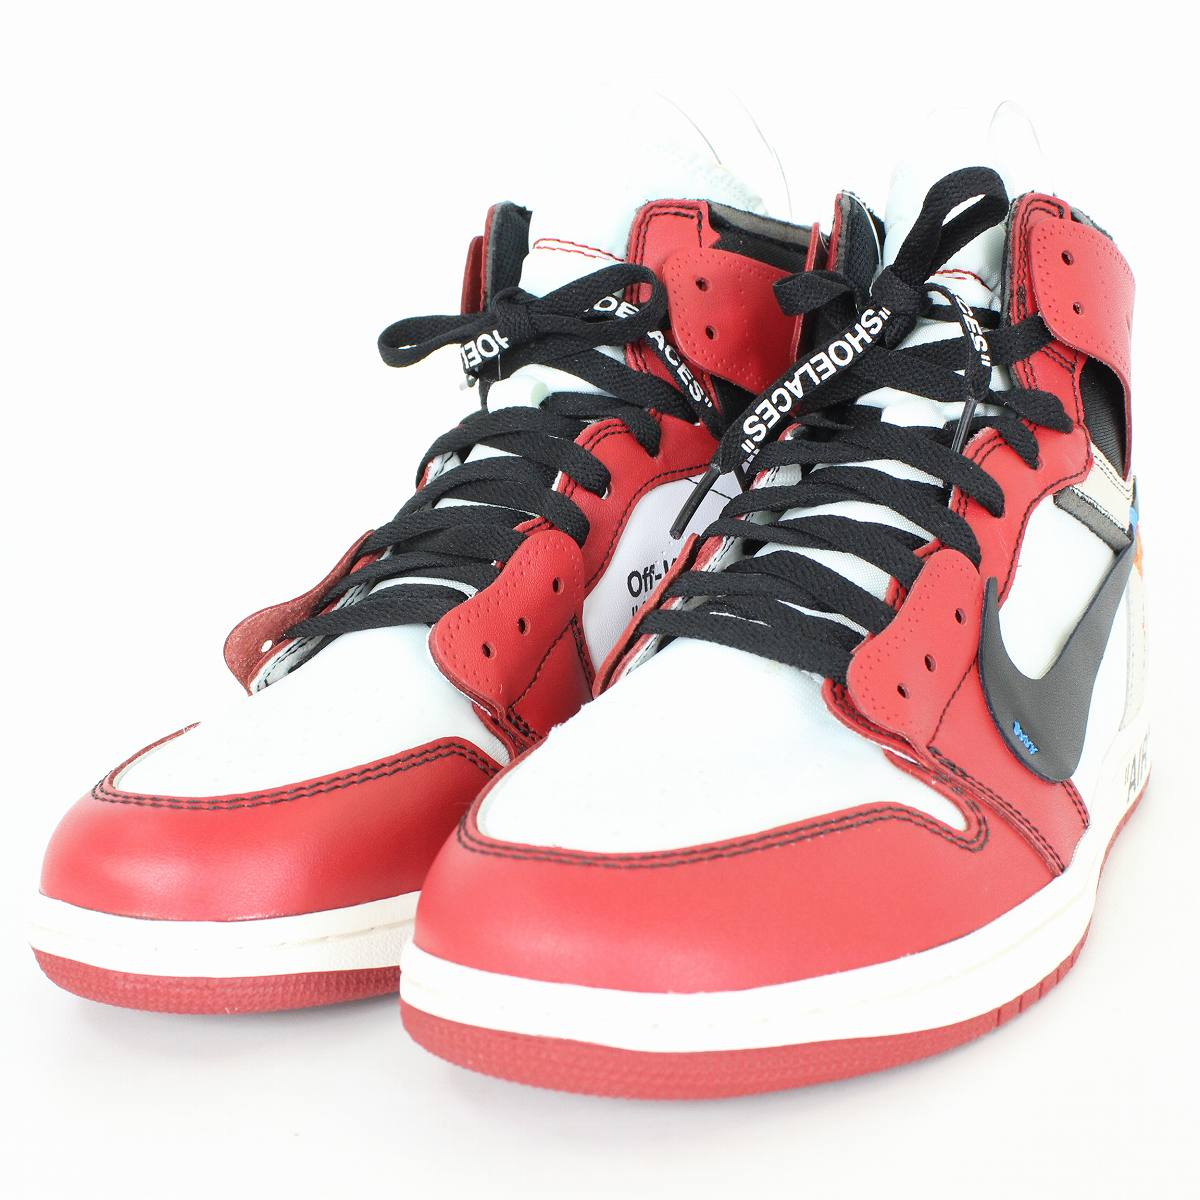 timeless design 57d53 8ae80 Nike /NIKE X off-white Air Jordan 1 sneakers (28.5cm/ red X white)  SB01bb187#rinkan*S